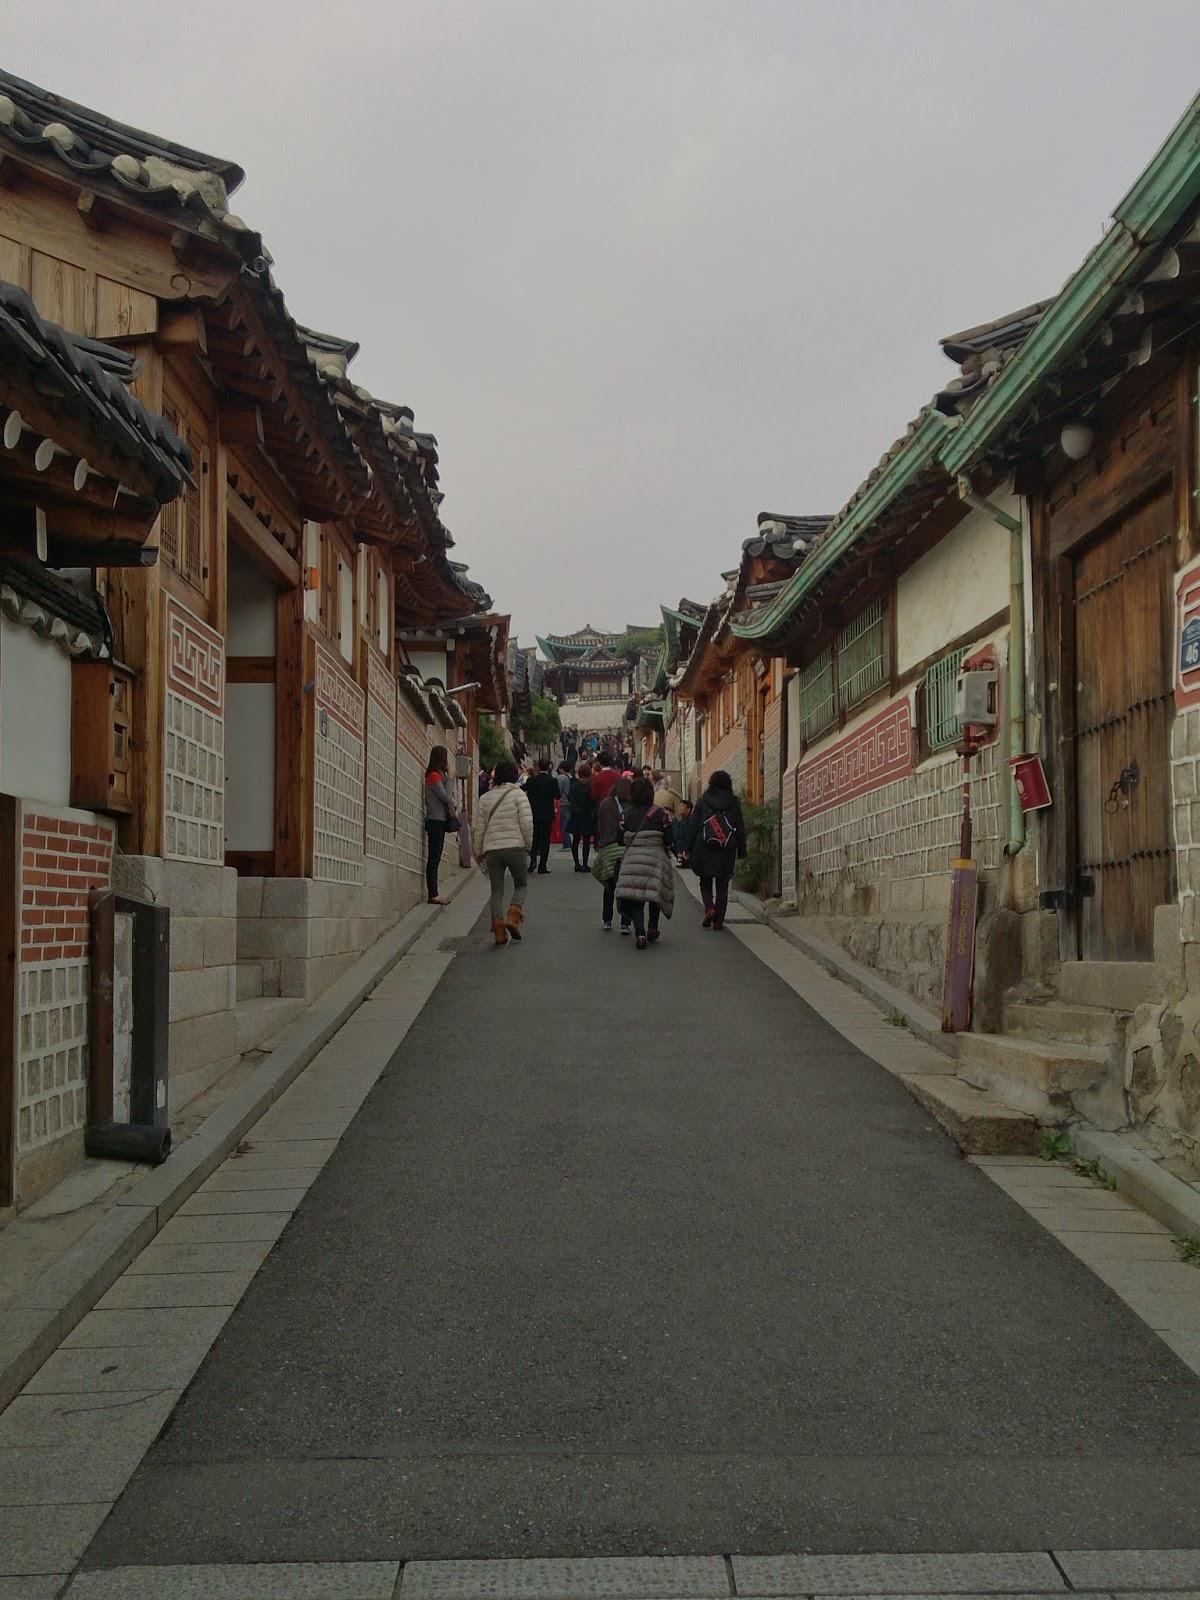 SixteenPenang: Seoul - Bukchon Hanok Village and Insadong